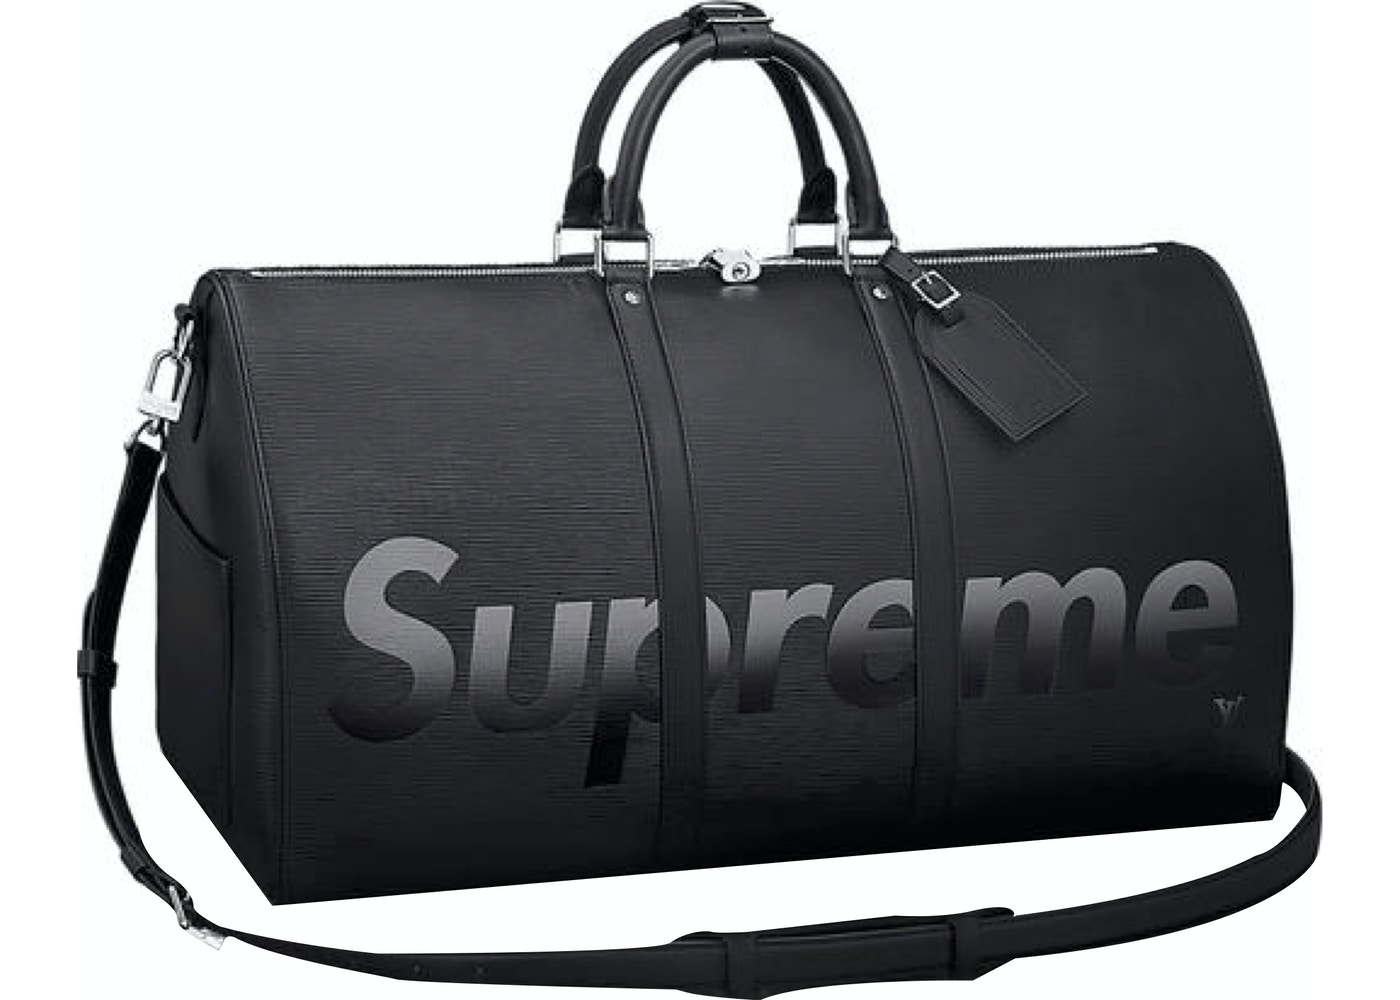 22f4ad7f55ad Buy   Sell Louis Vuitton Supreme Handbags - Average Sale Price